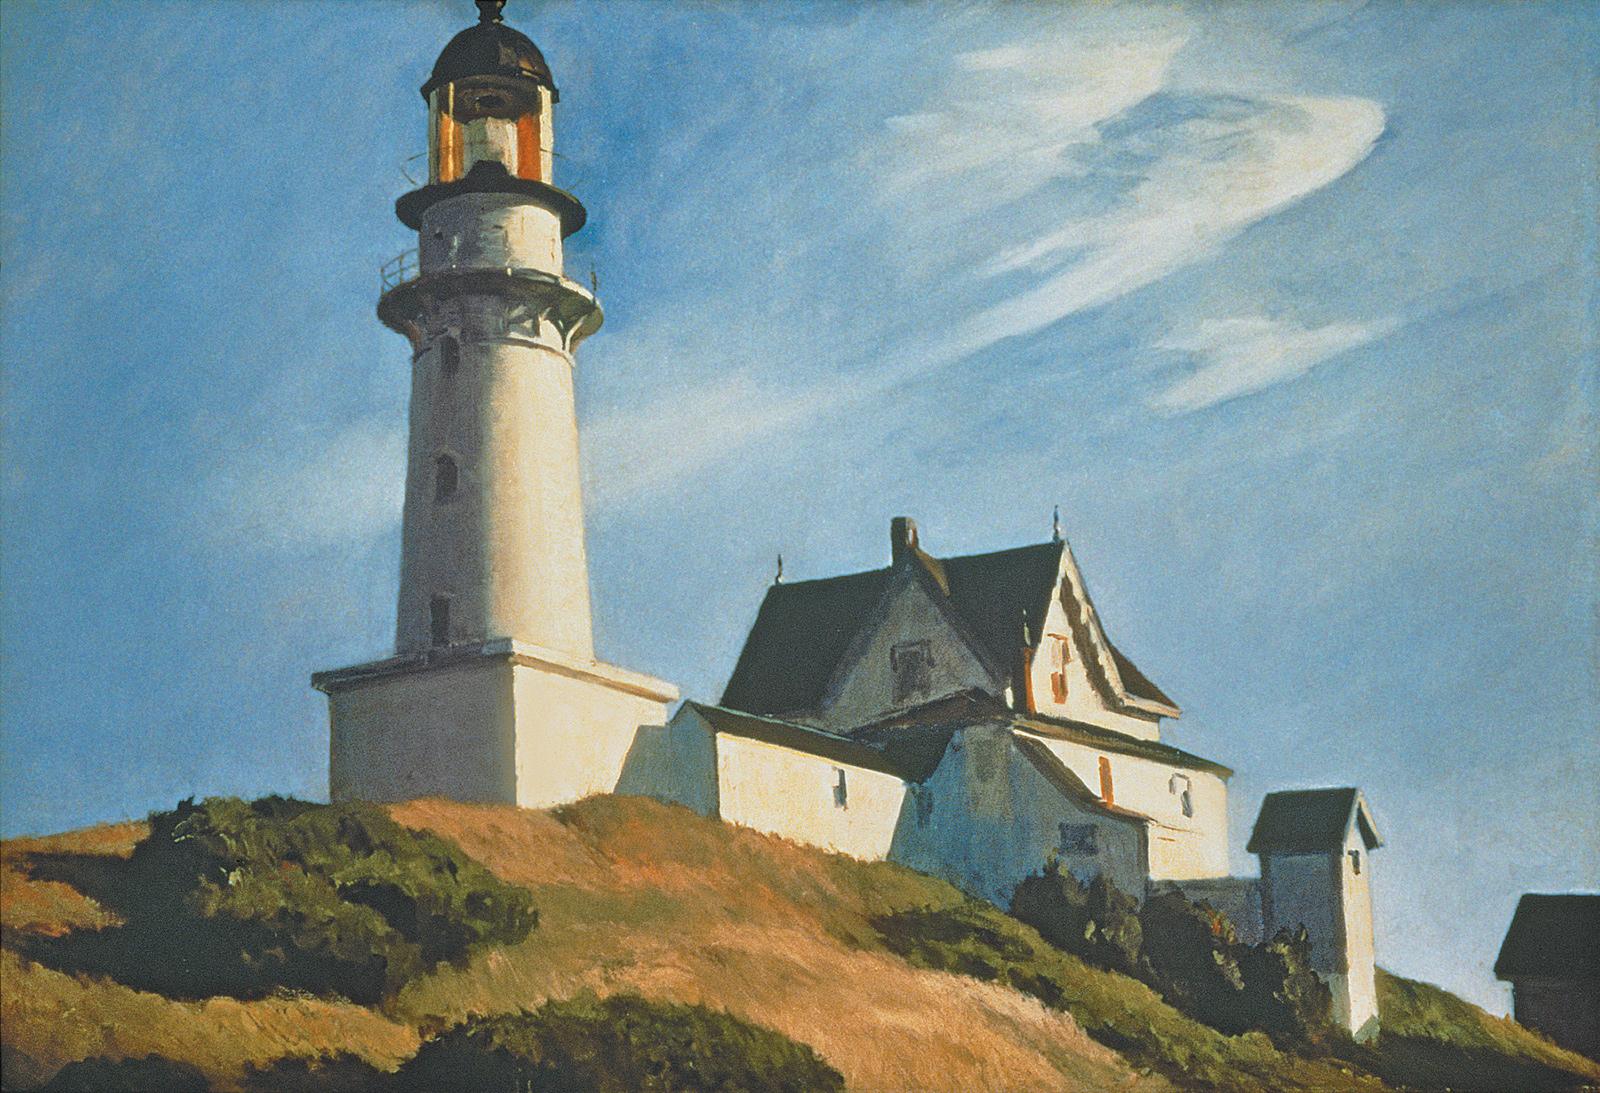 Edward Hopper Stile Biografia Opere E Citazioni